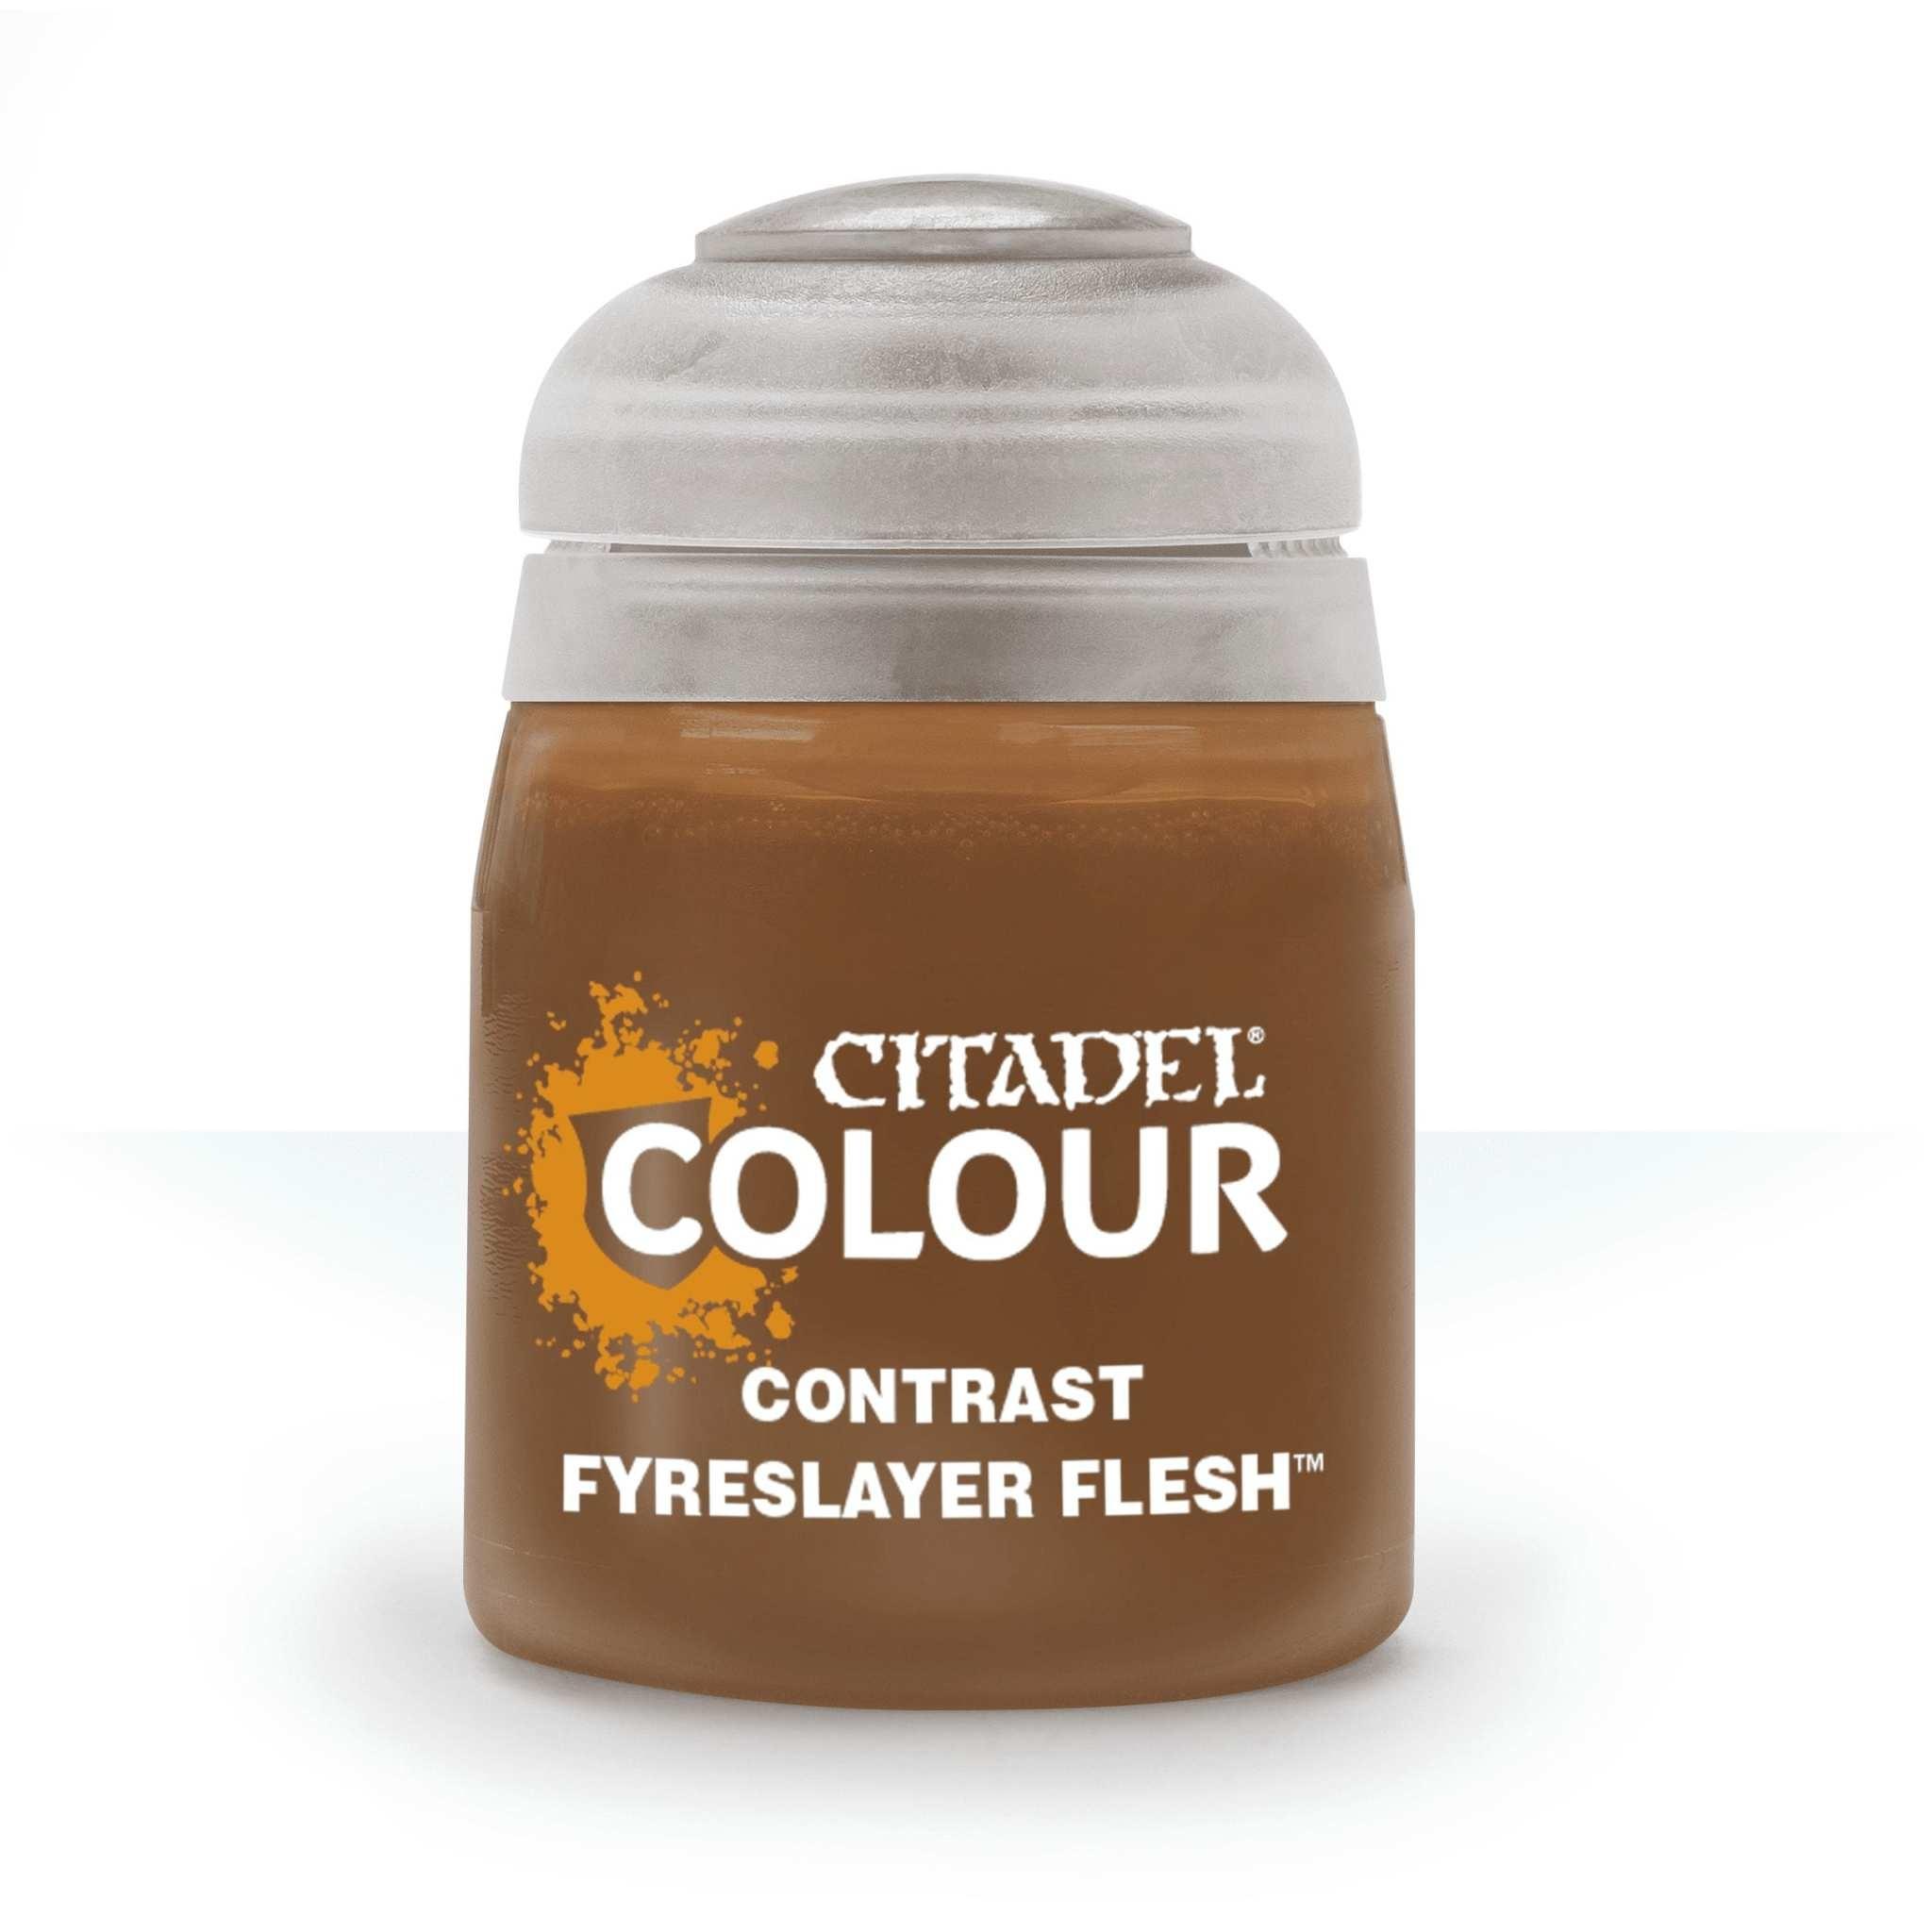 Citadel Paint Contrast: Fyreslayer Flesh